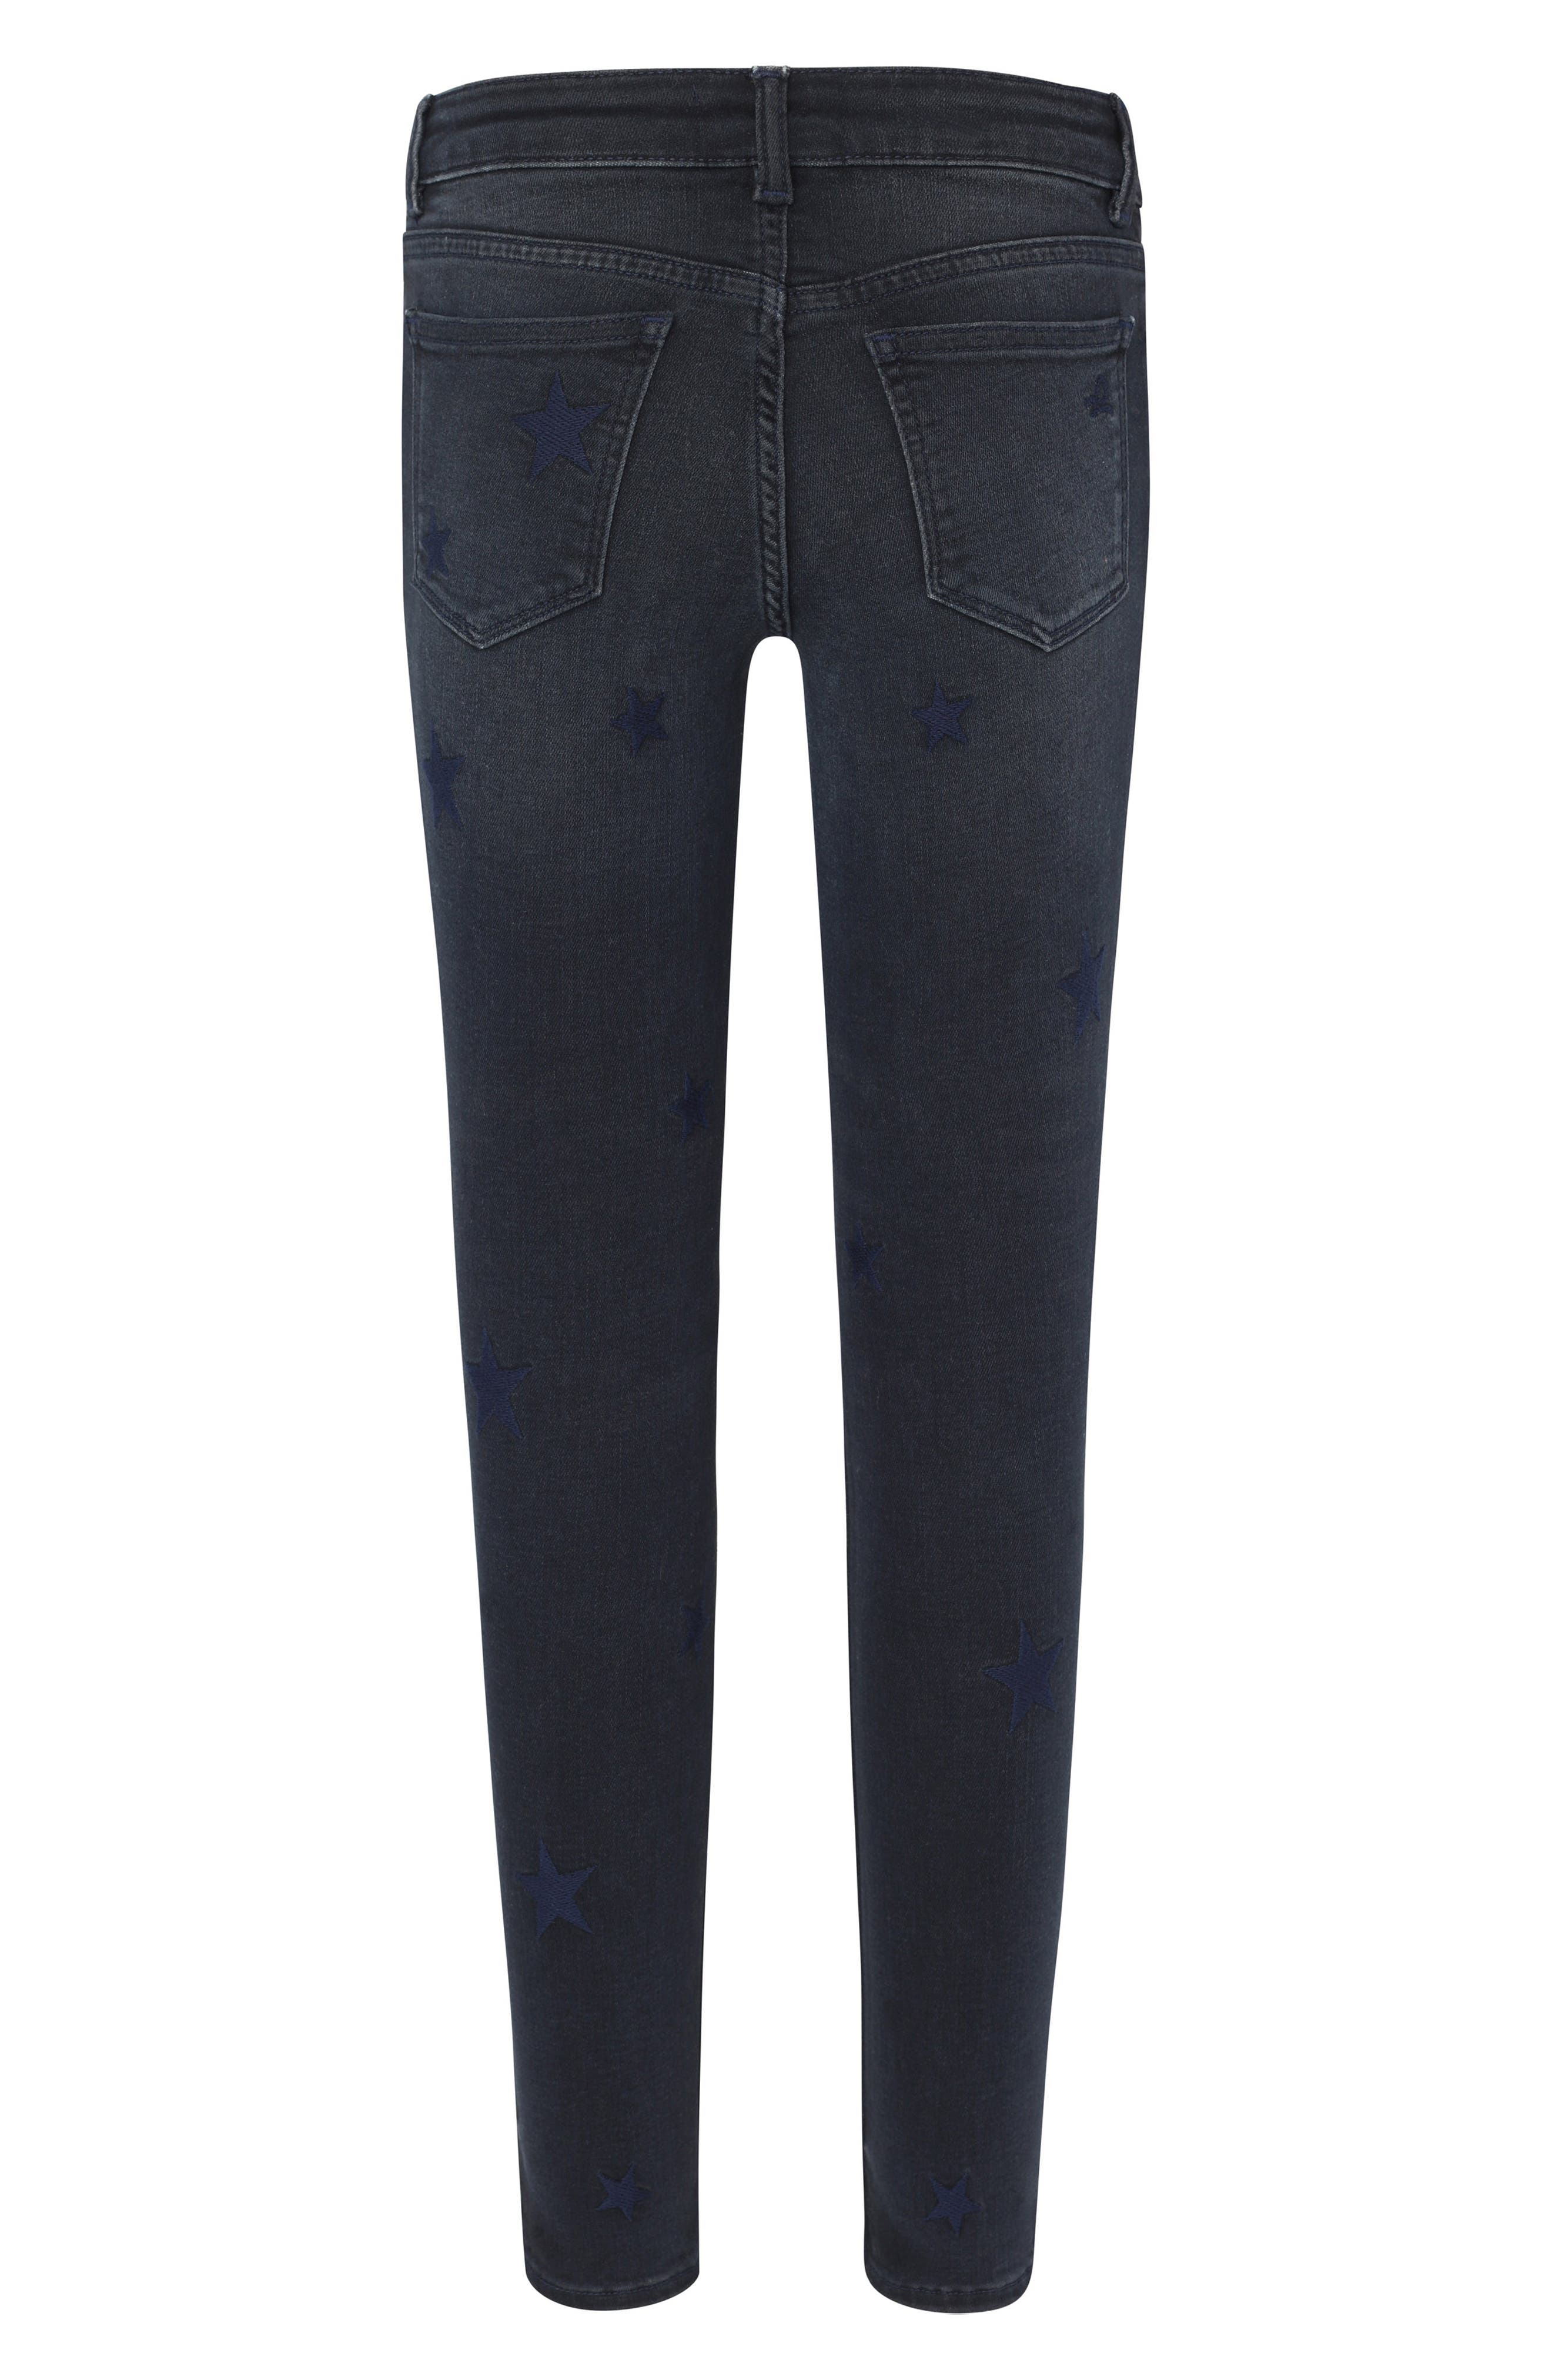 Star Embroidered Skinny Jeans,                             Alternate thumbnail 2, color,                             STARSTRUCK